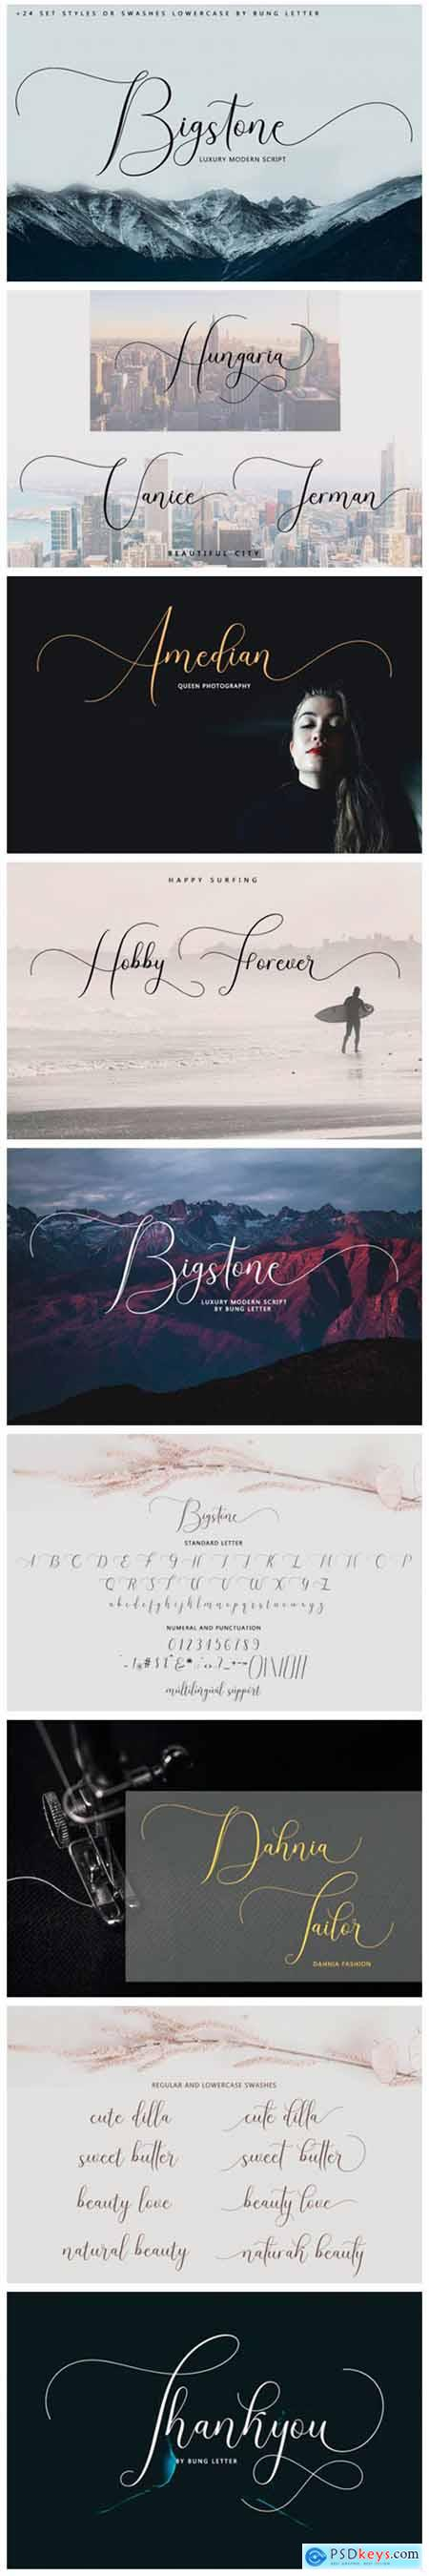 Bigstone Font